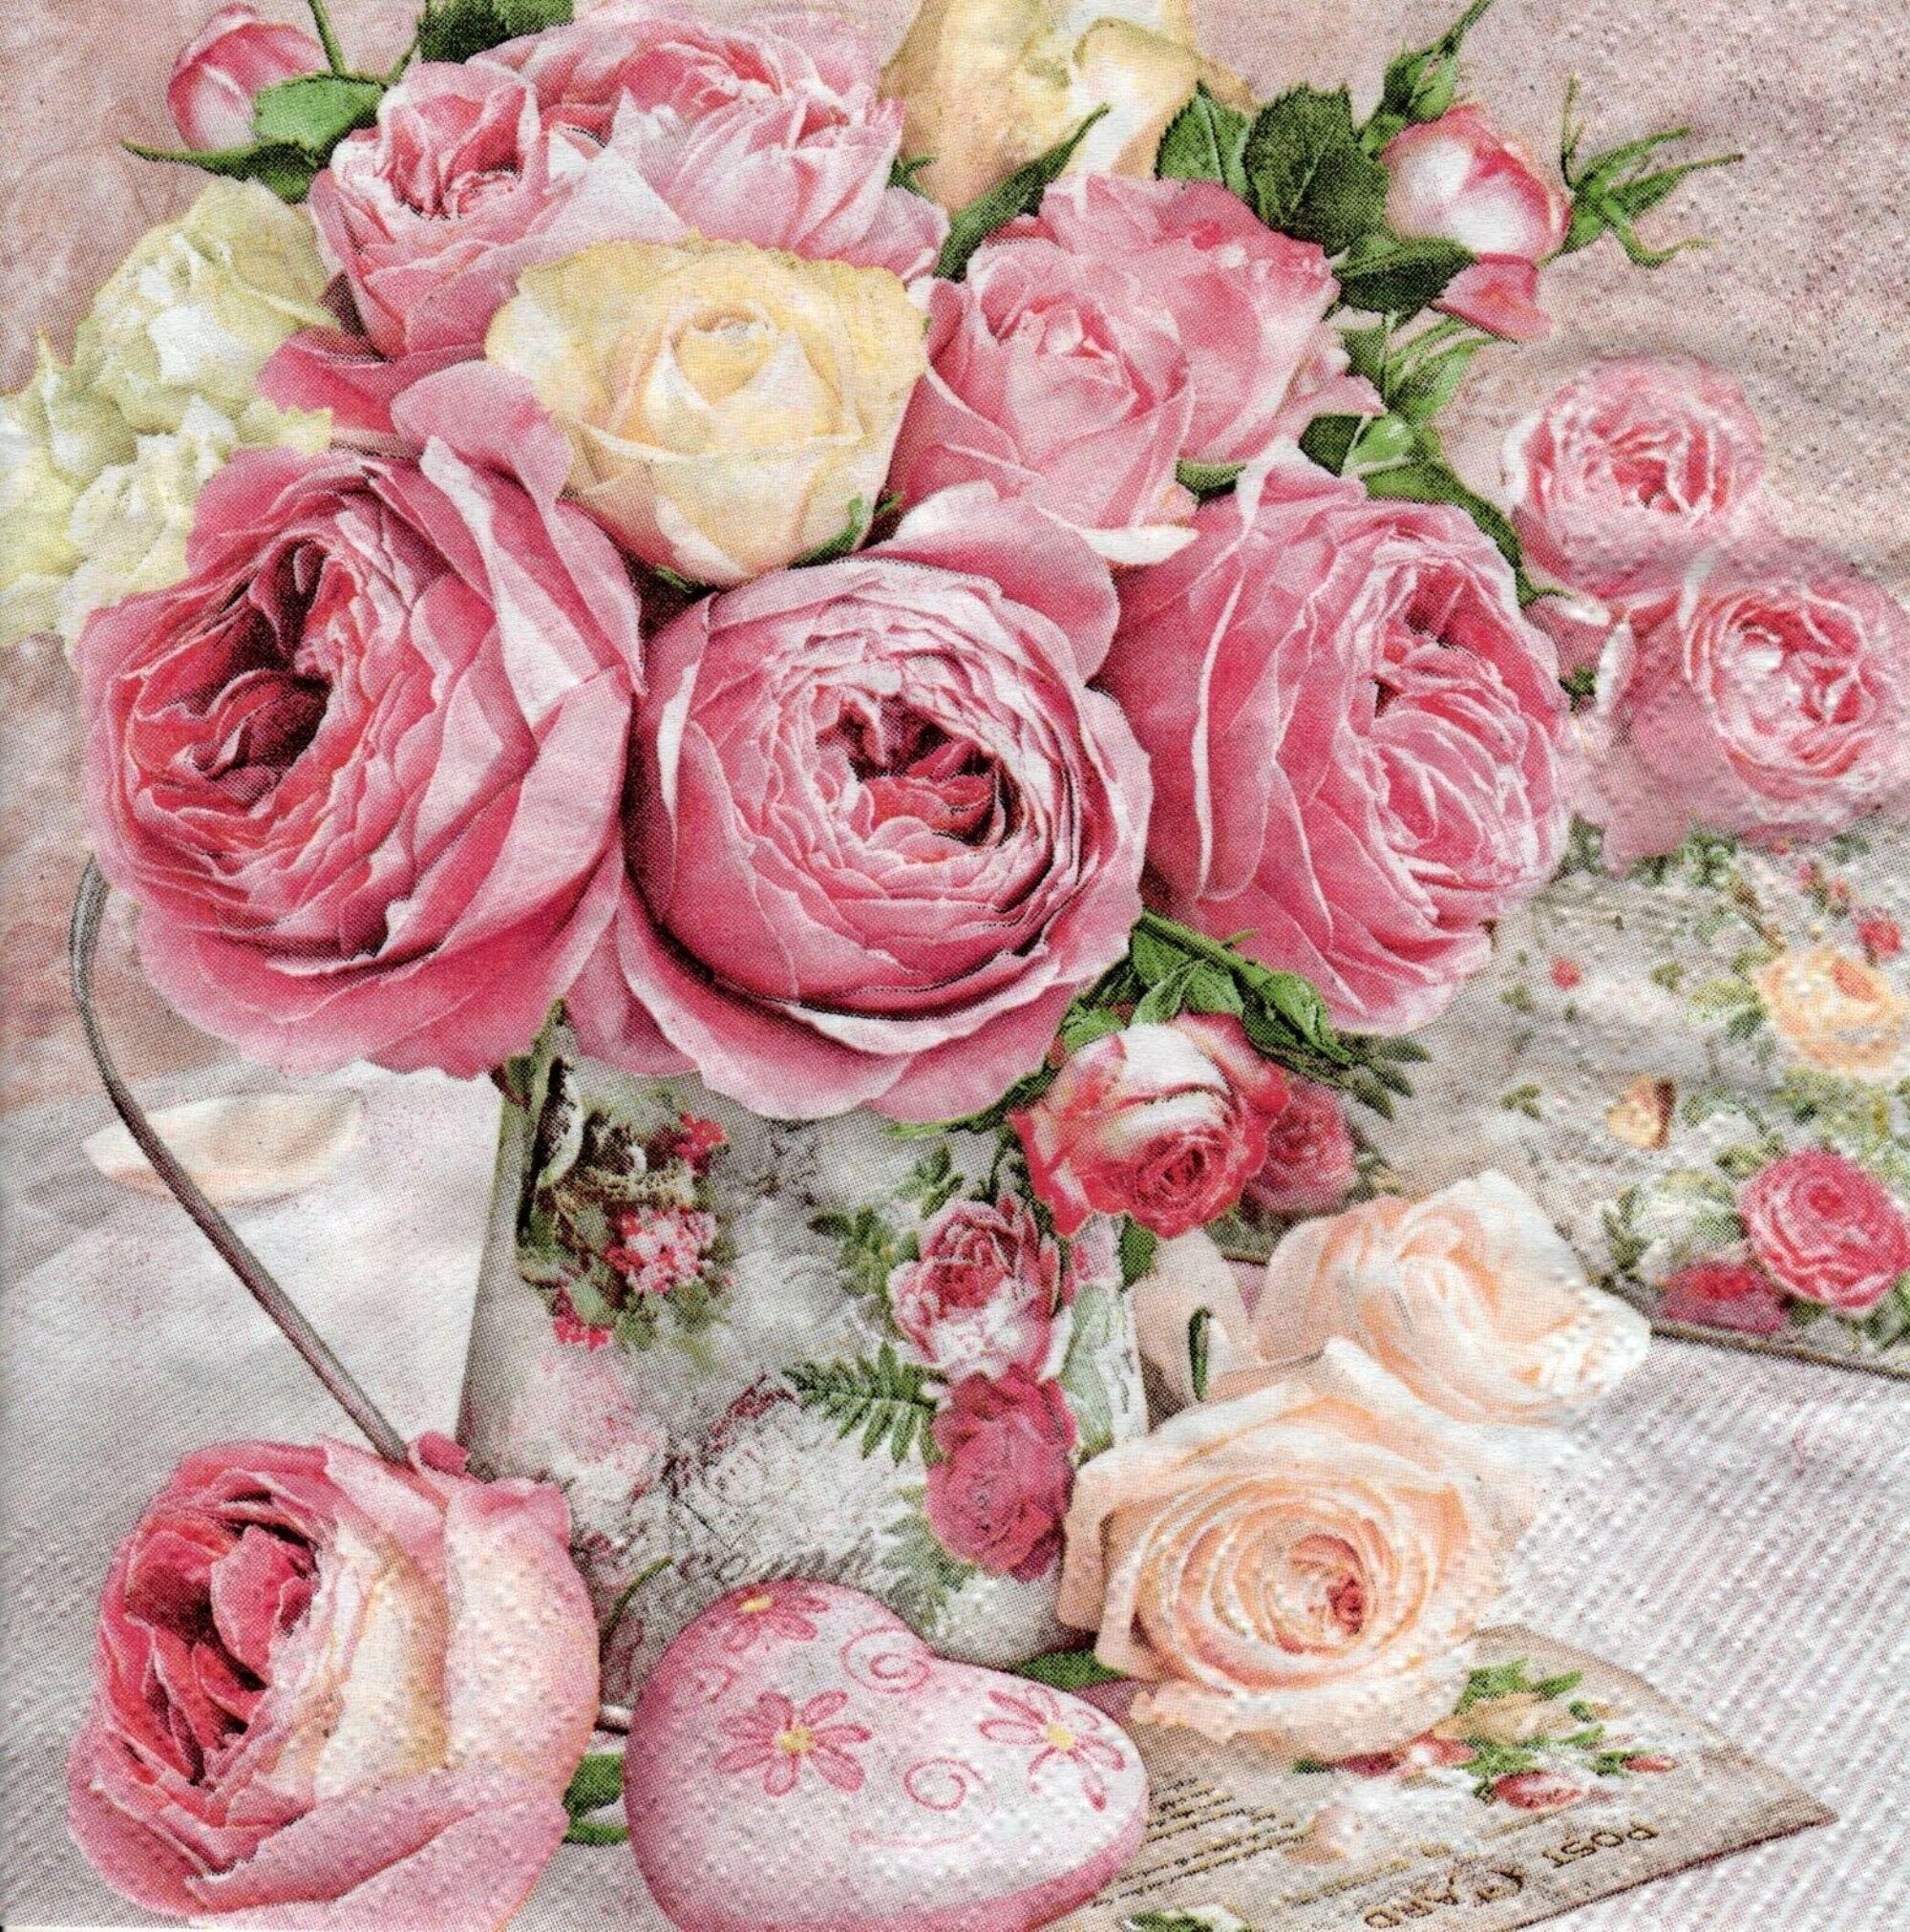 4 Shabby Paper napkins Serviettes, Pink Roses Paper Napkins, Crafts Supplies, Roses Serviettes, Stunning Lunch Napkins, Party Napkins, NEW #papernapkins